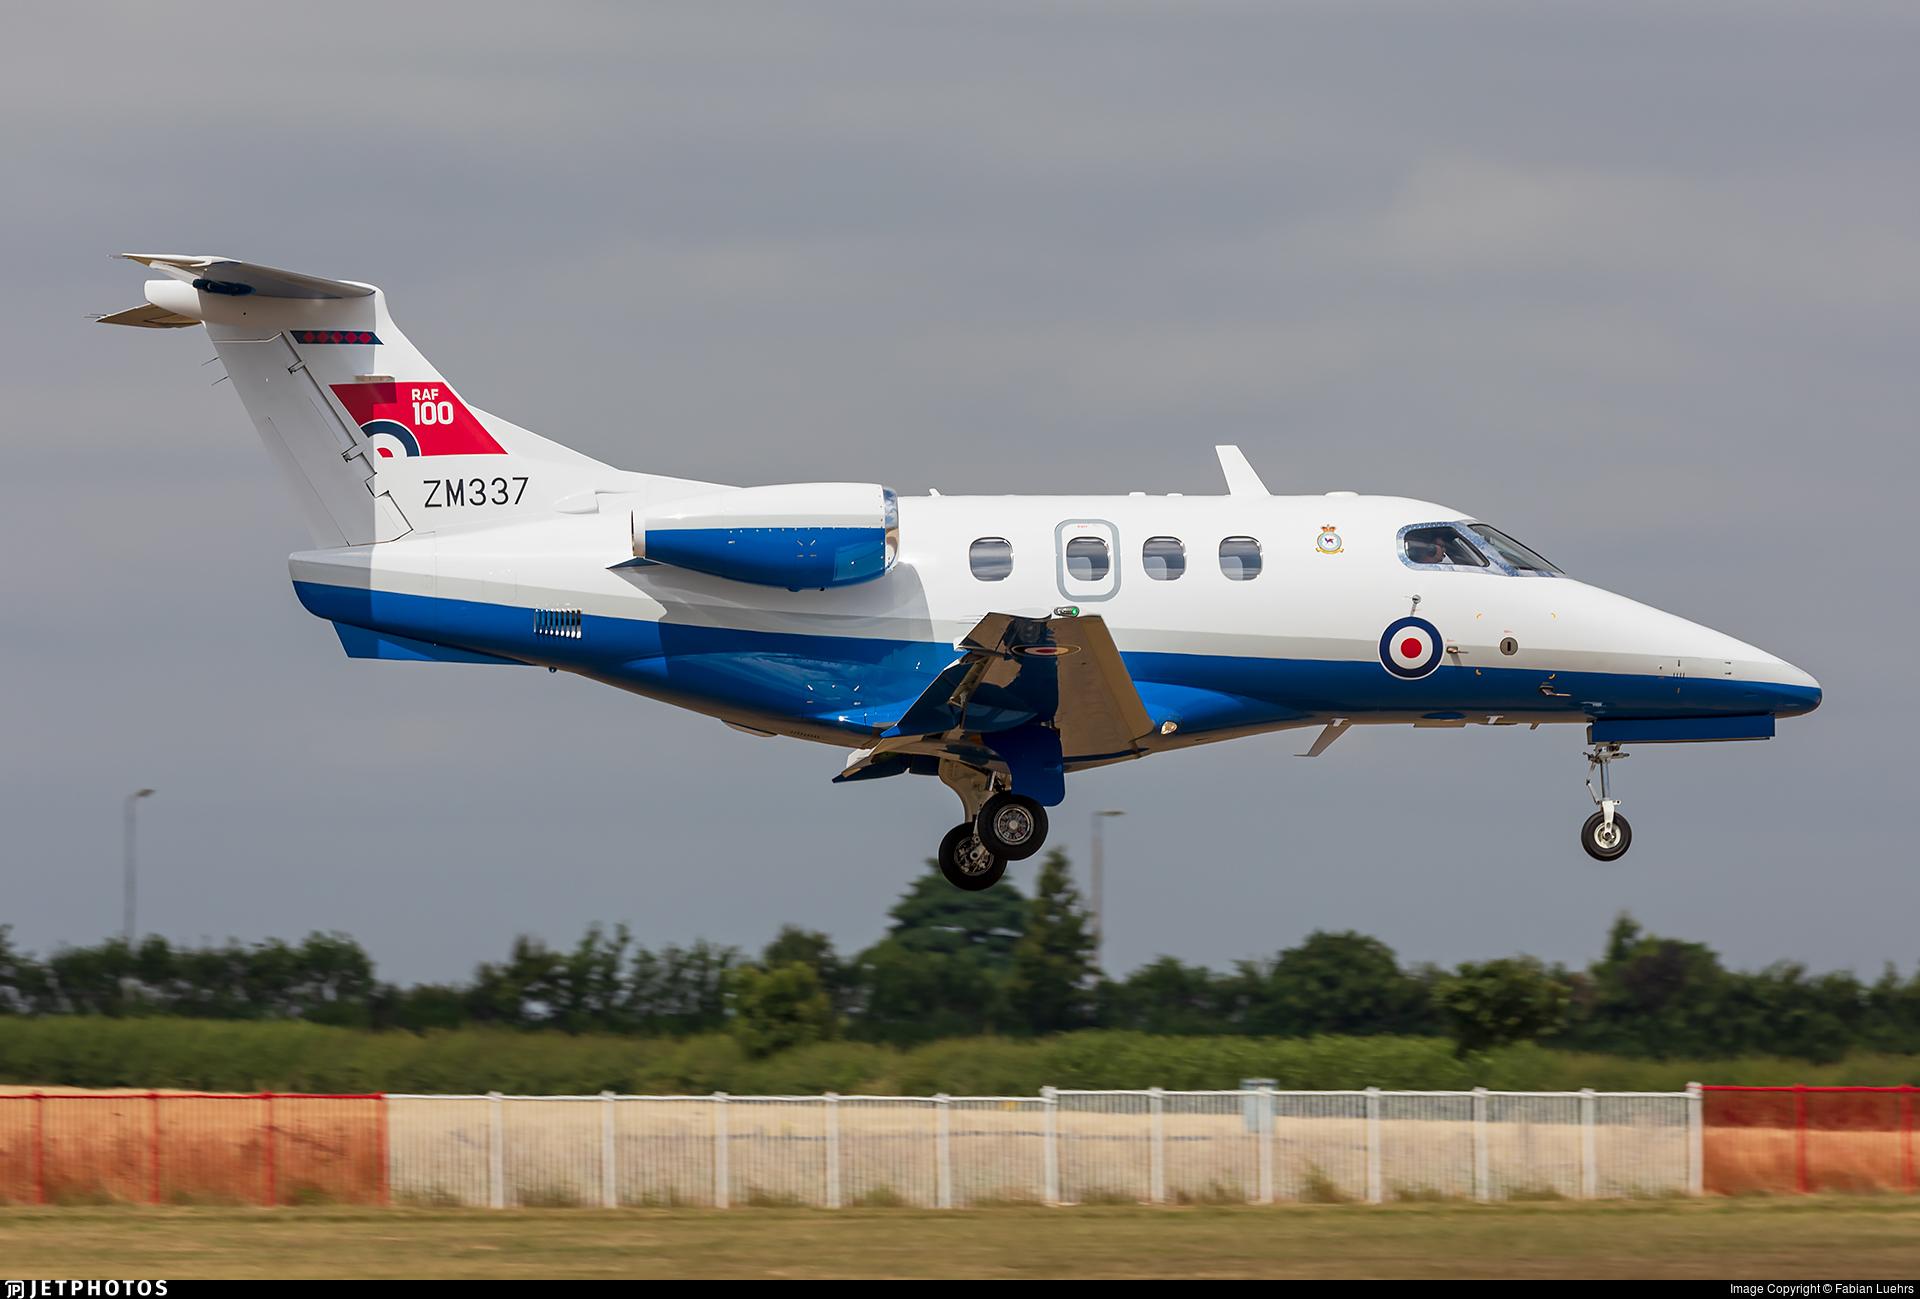 ZM337 - Embraer Phenom T.1 - United Kingdom - Royal Air Force (RAF)